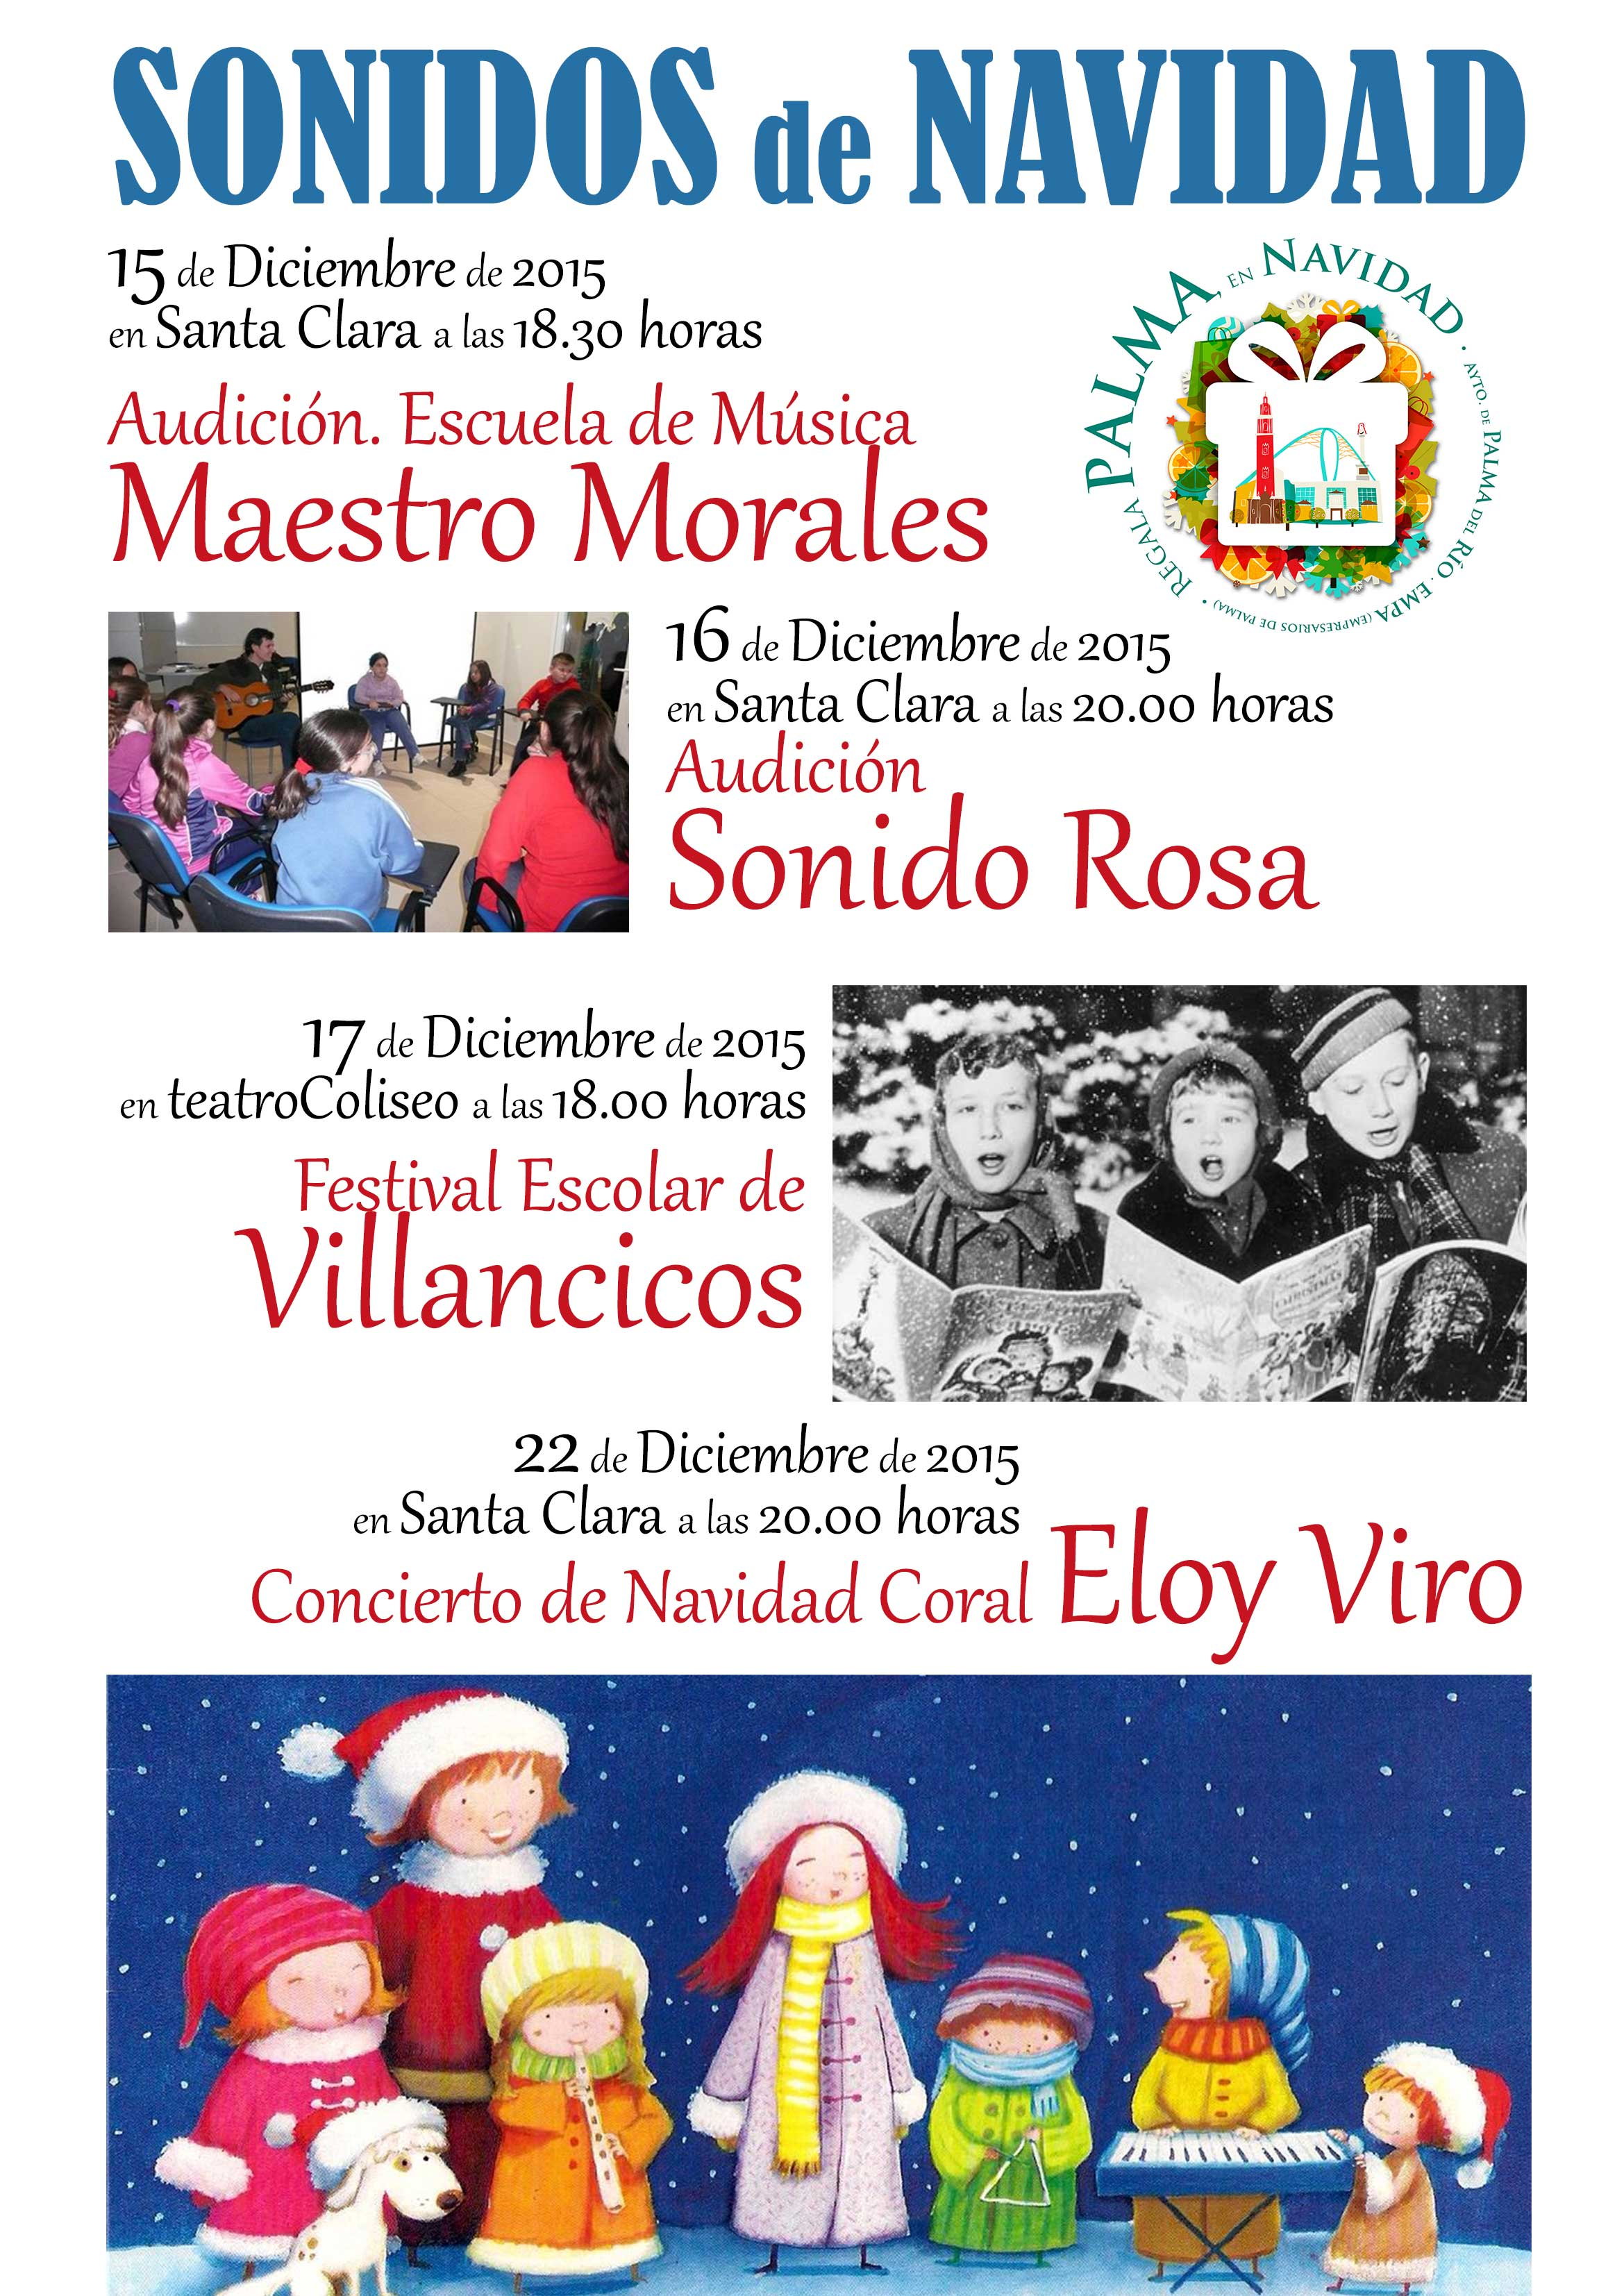 https://www.palmadelrio.es/sites/default/files/cartel-sonidos-navidad2015.jpg